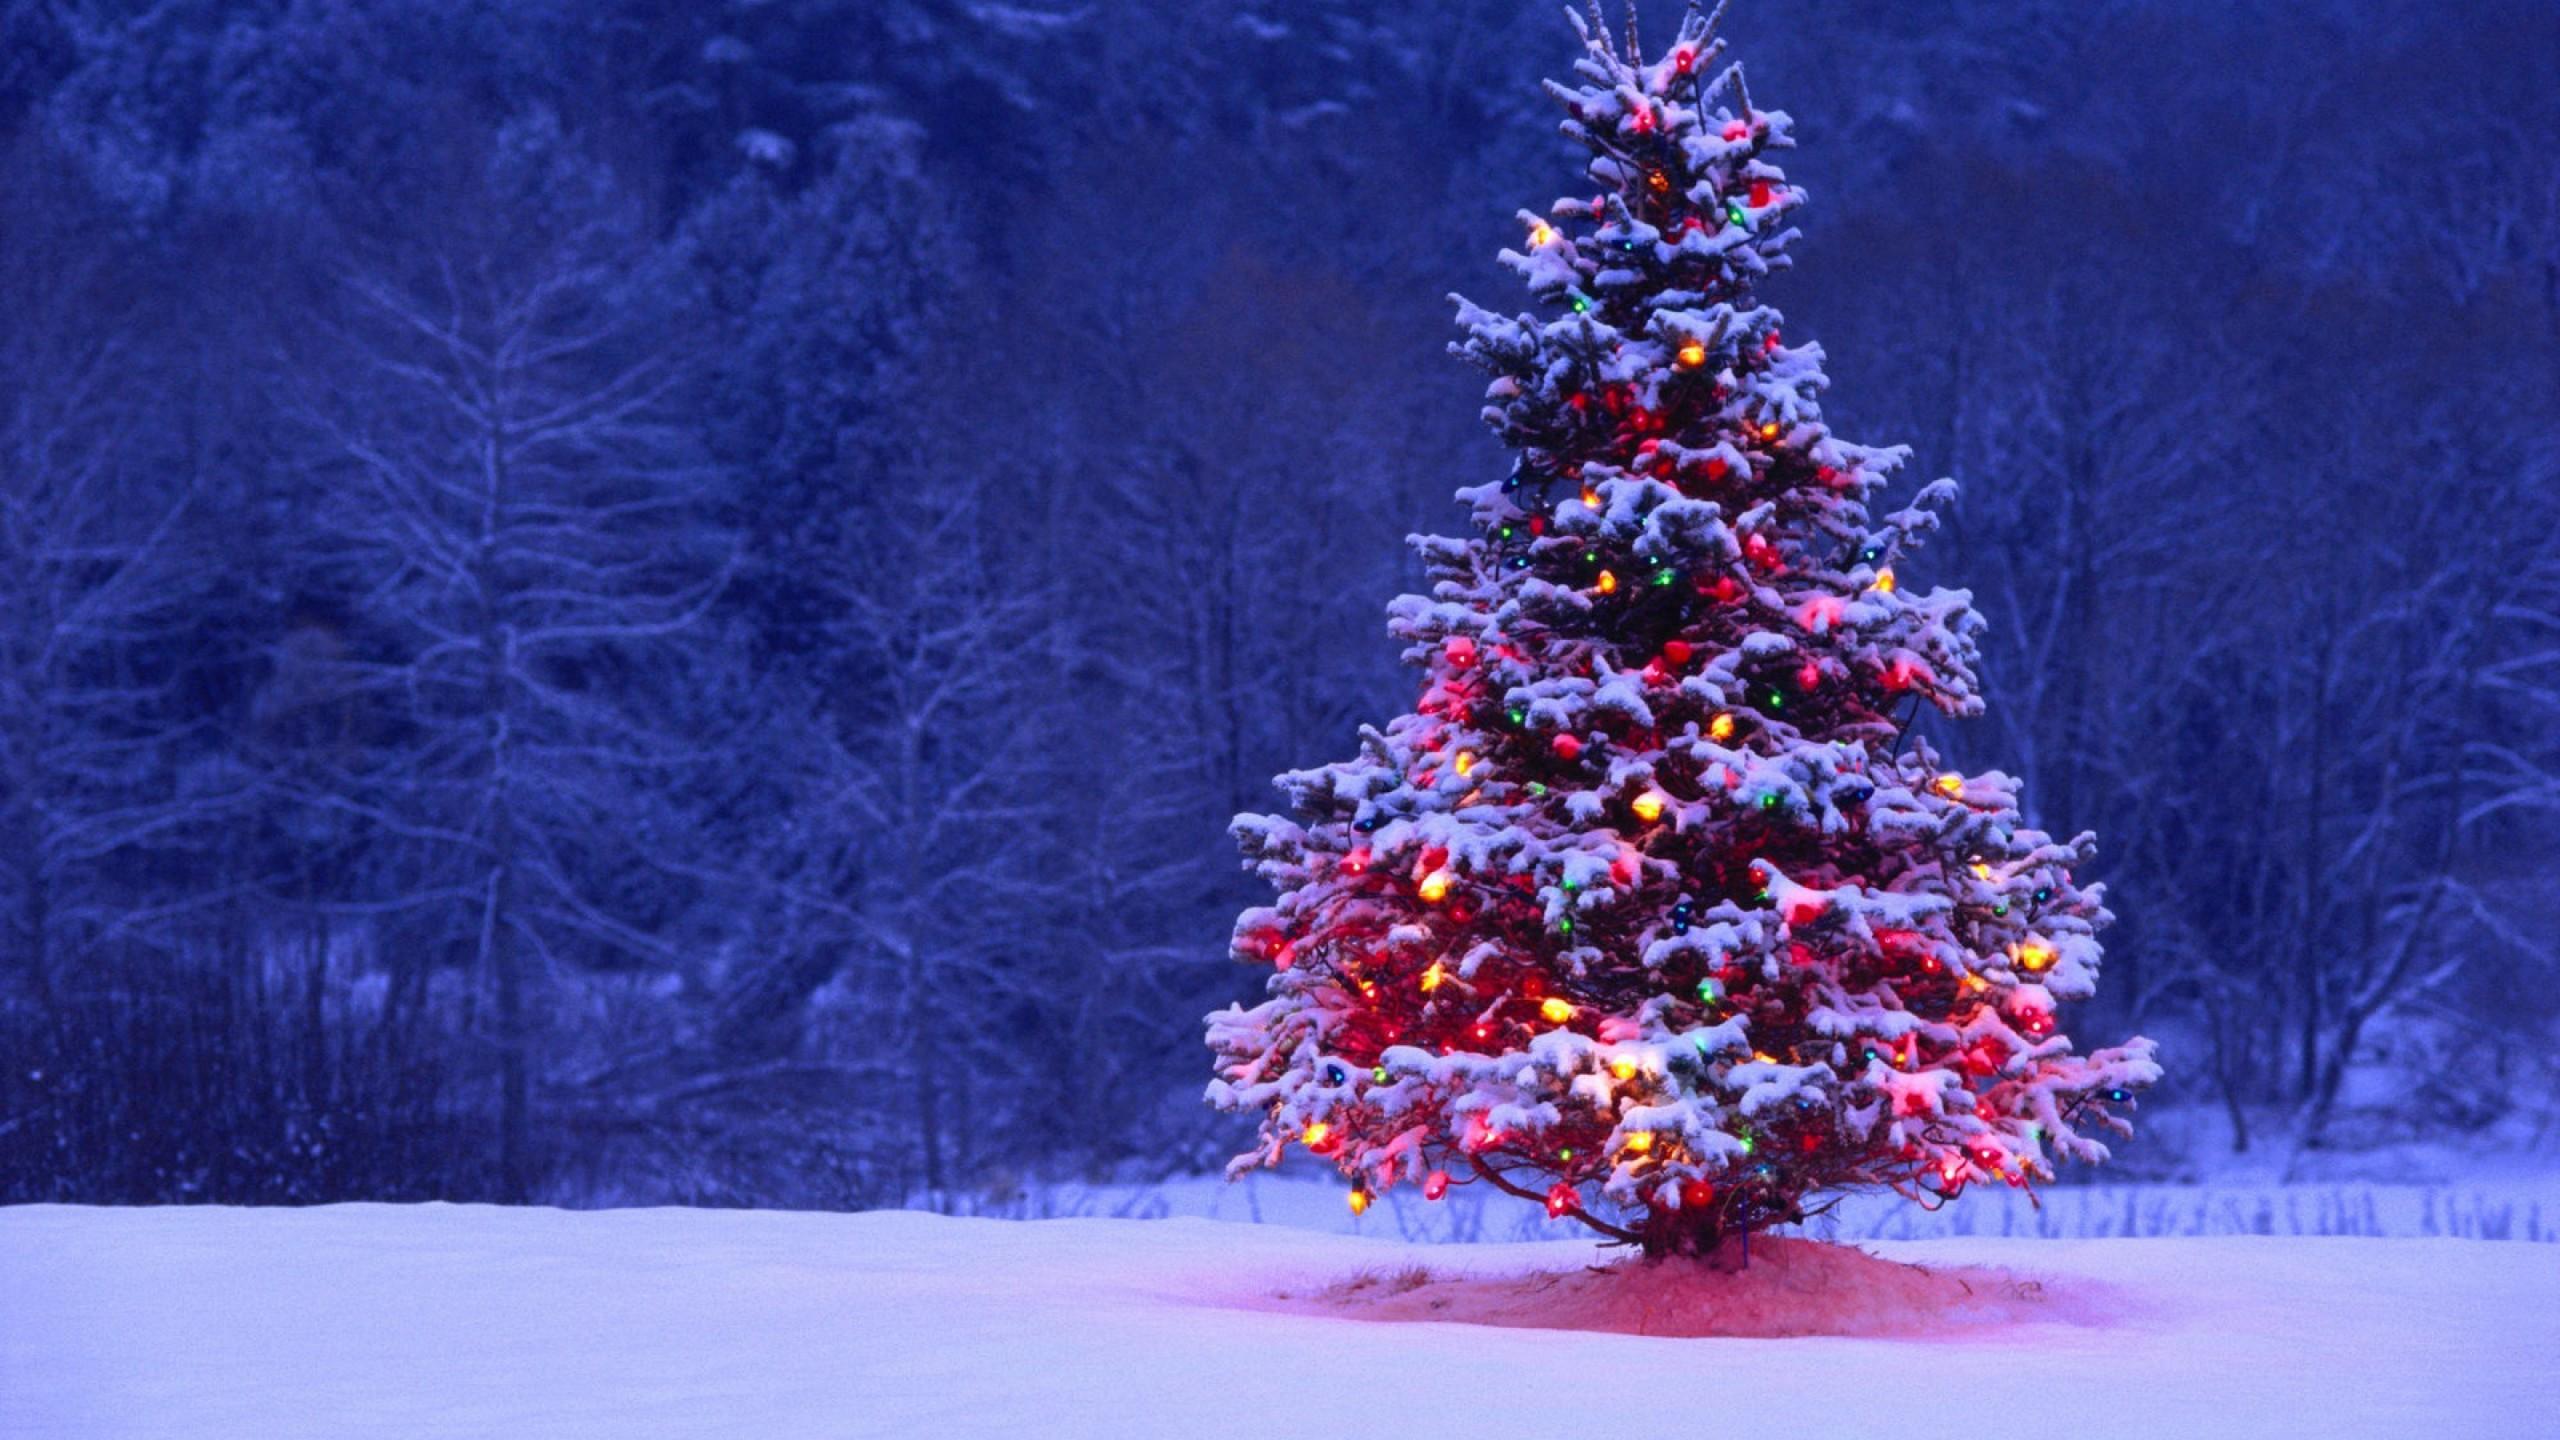 Christmas Tree Lights Snow Forest Holiday Desktop Wallpaper Uploaded by  DesktopWalls